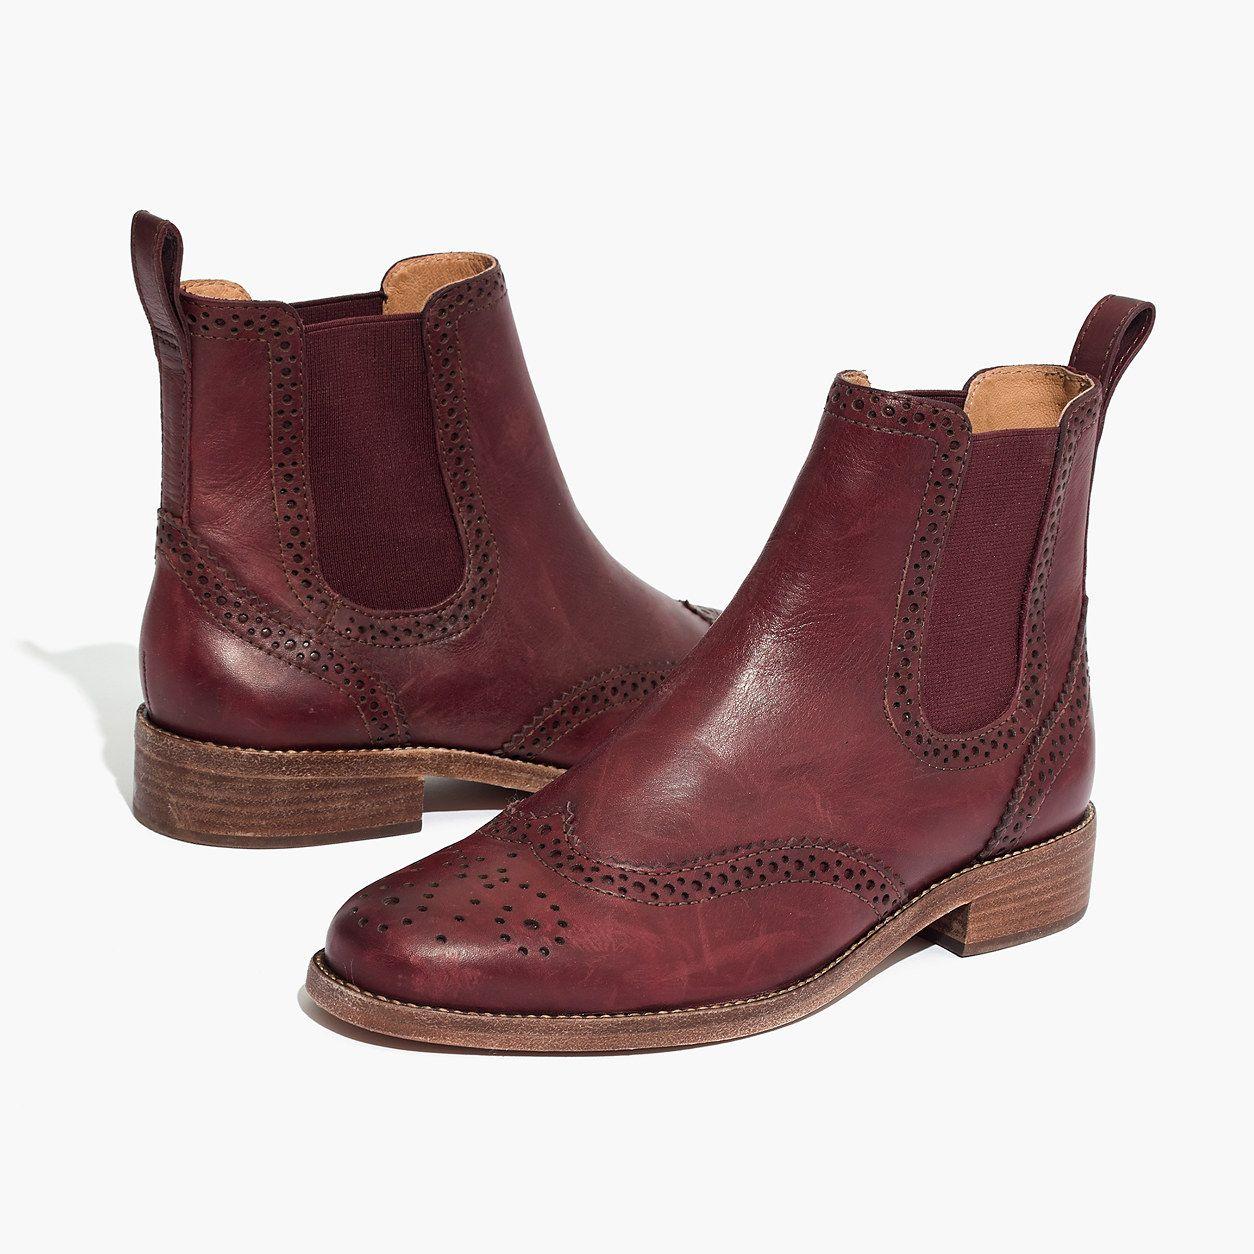 Madewell Womens Ivan Brogue Chelsea Boot In Dark Cabernet Boots Brogue Chelsea Boots Chelsea Boots